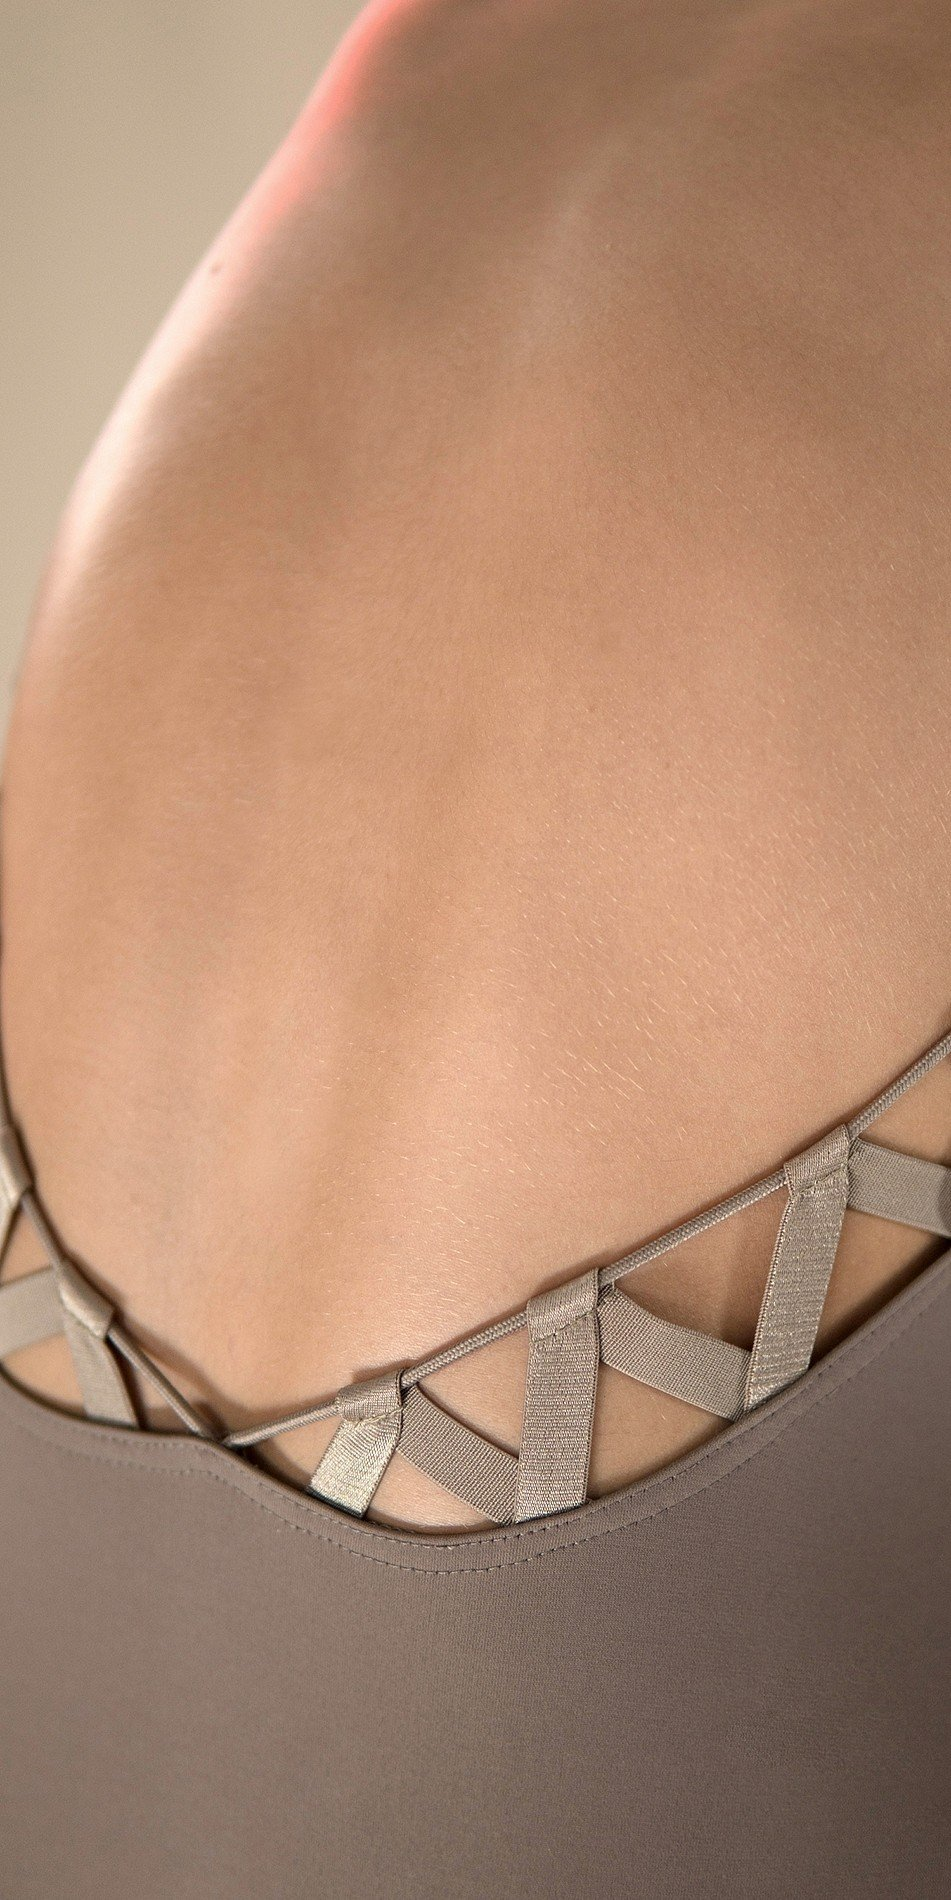 CHEVRON long sleeve laced back leotard khaki 4 r 2